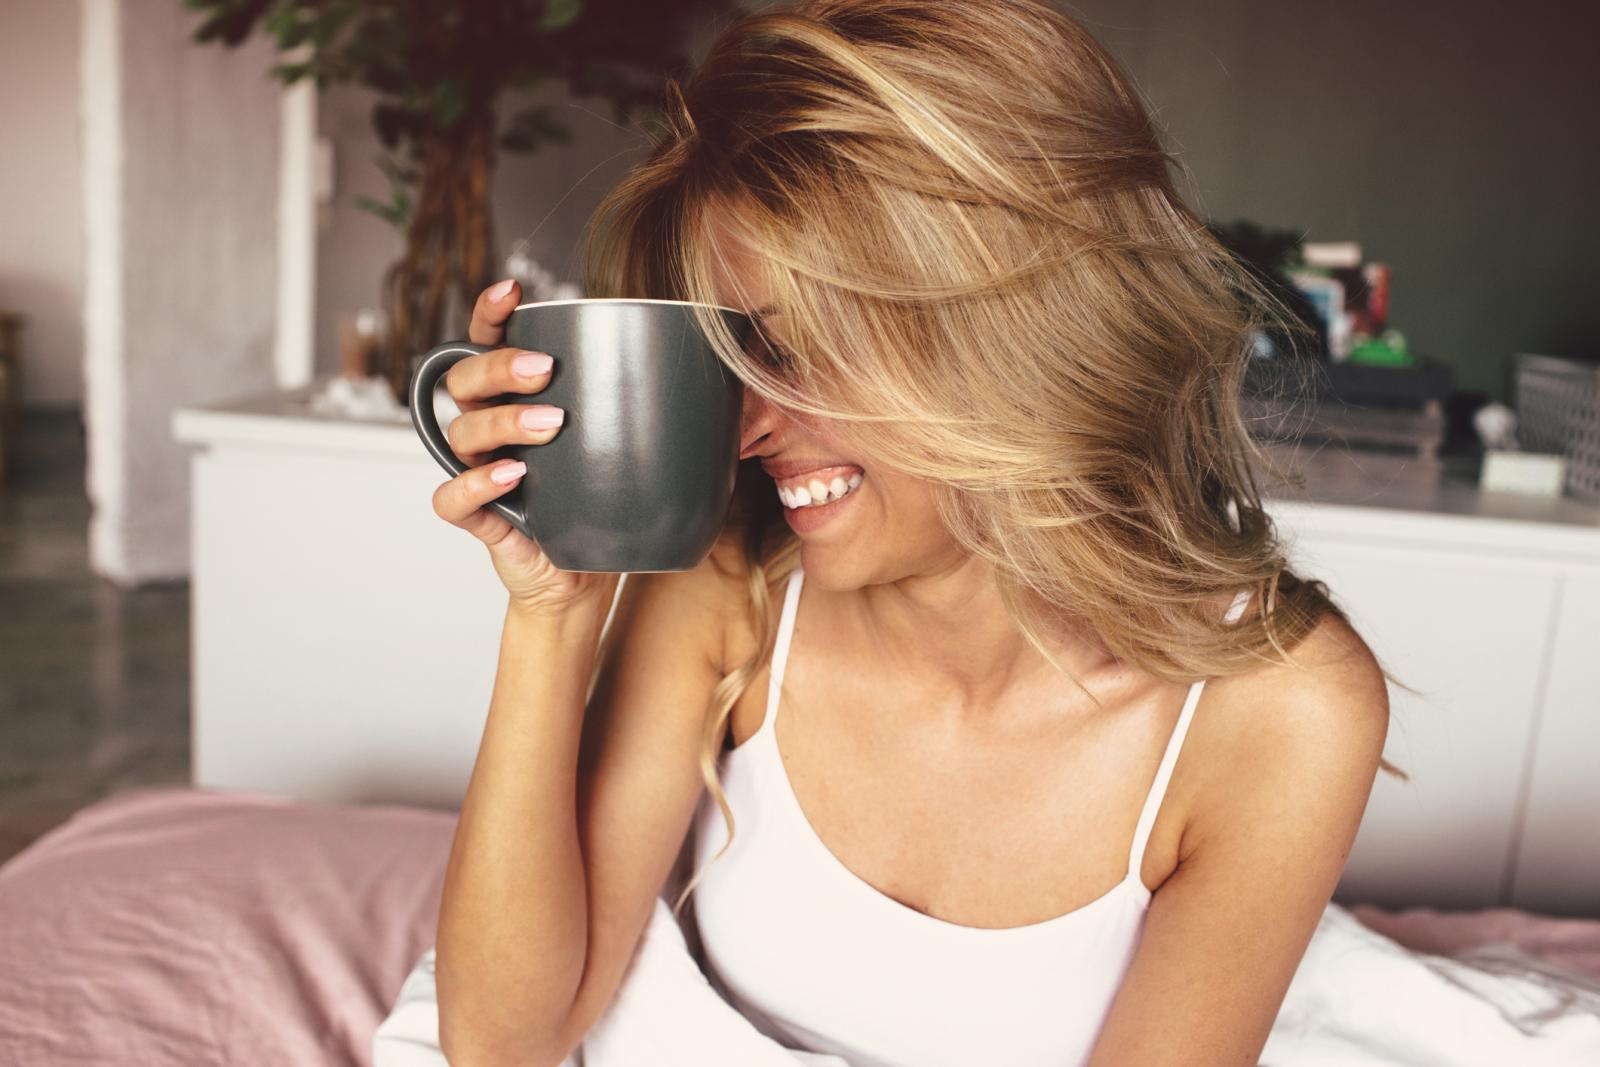 Bez obzira na vaš izbor kofeina, oba napitka donose brojne zdravstvene dobrobiti.